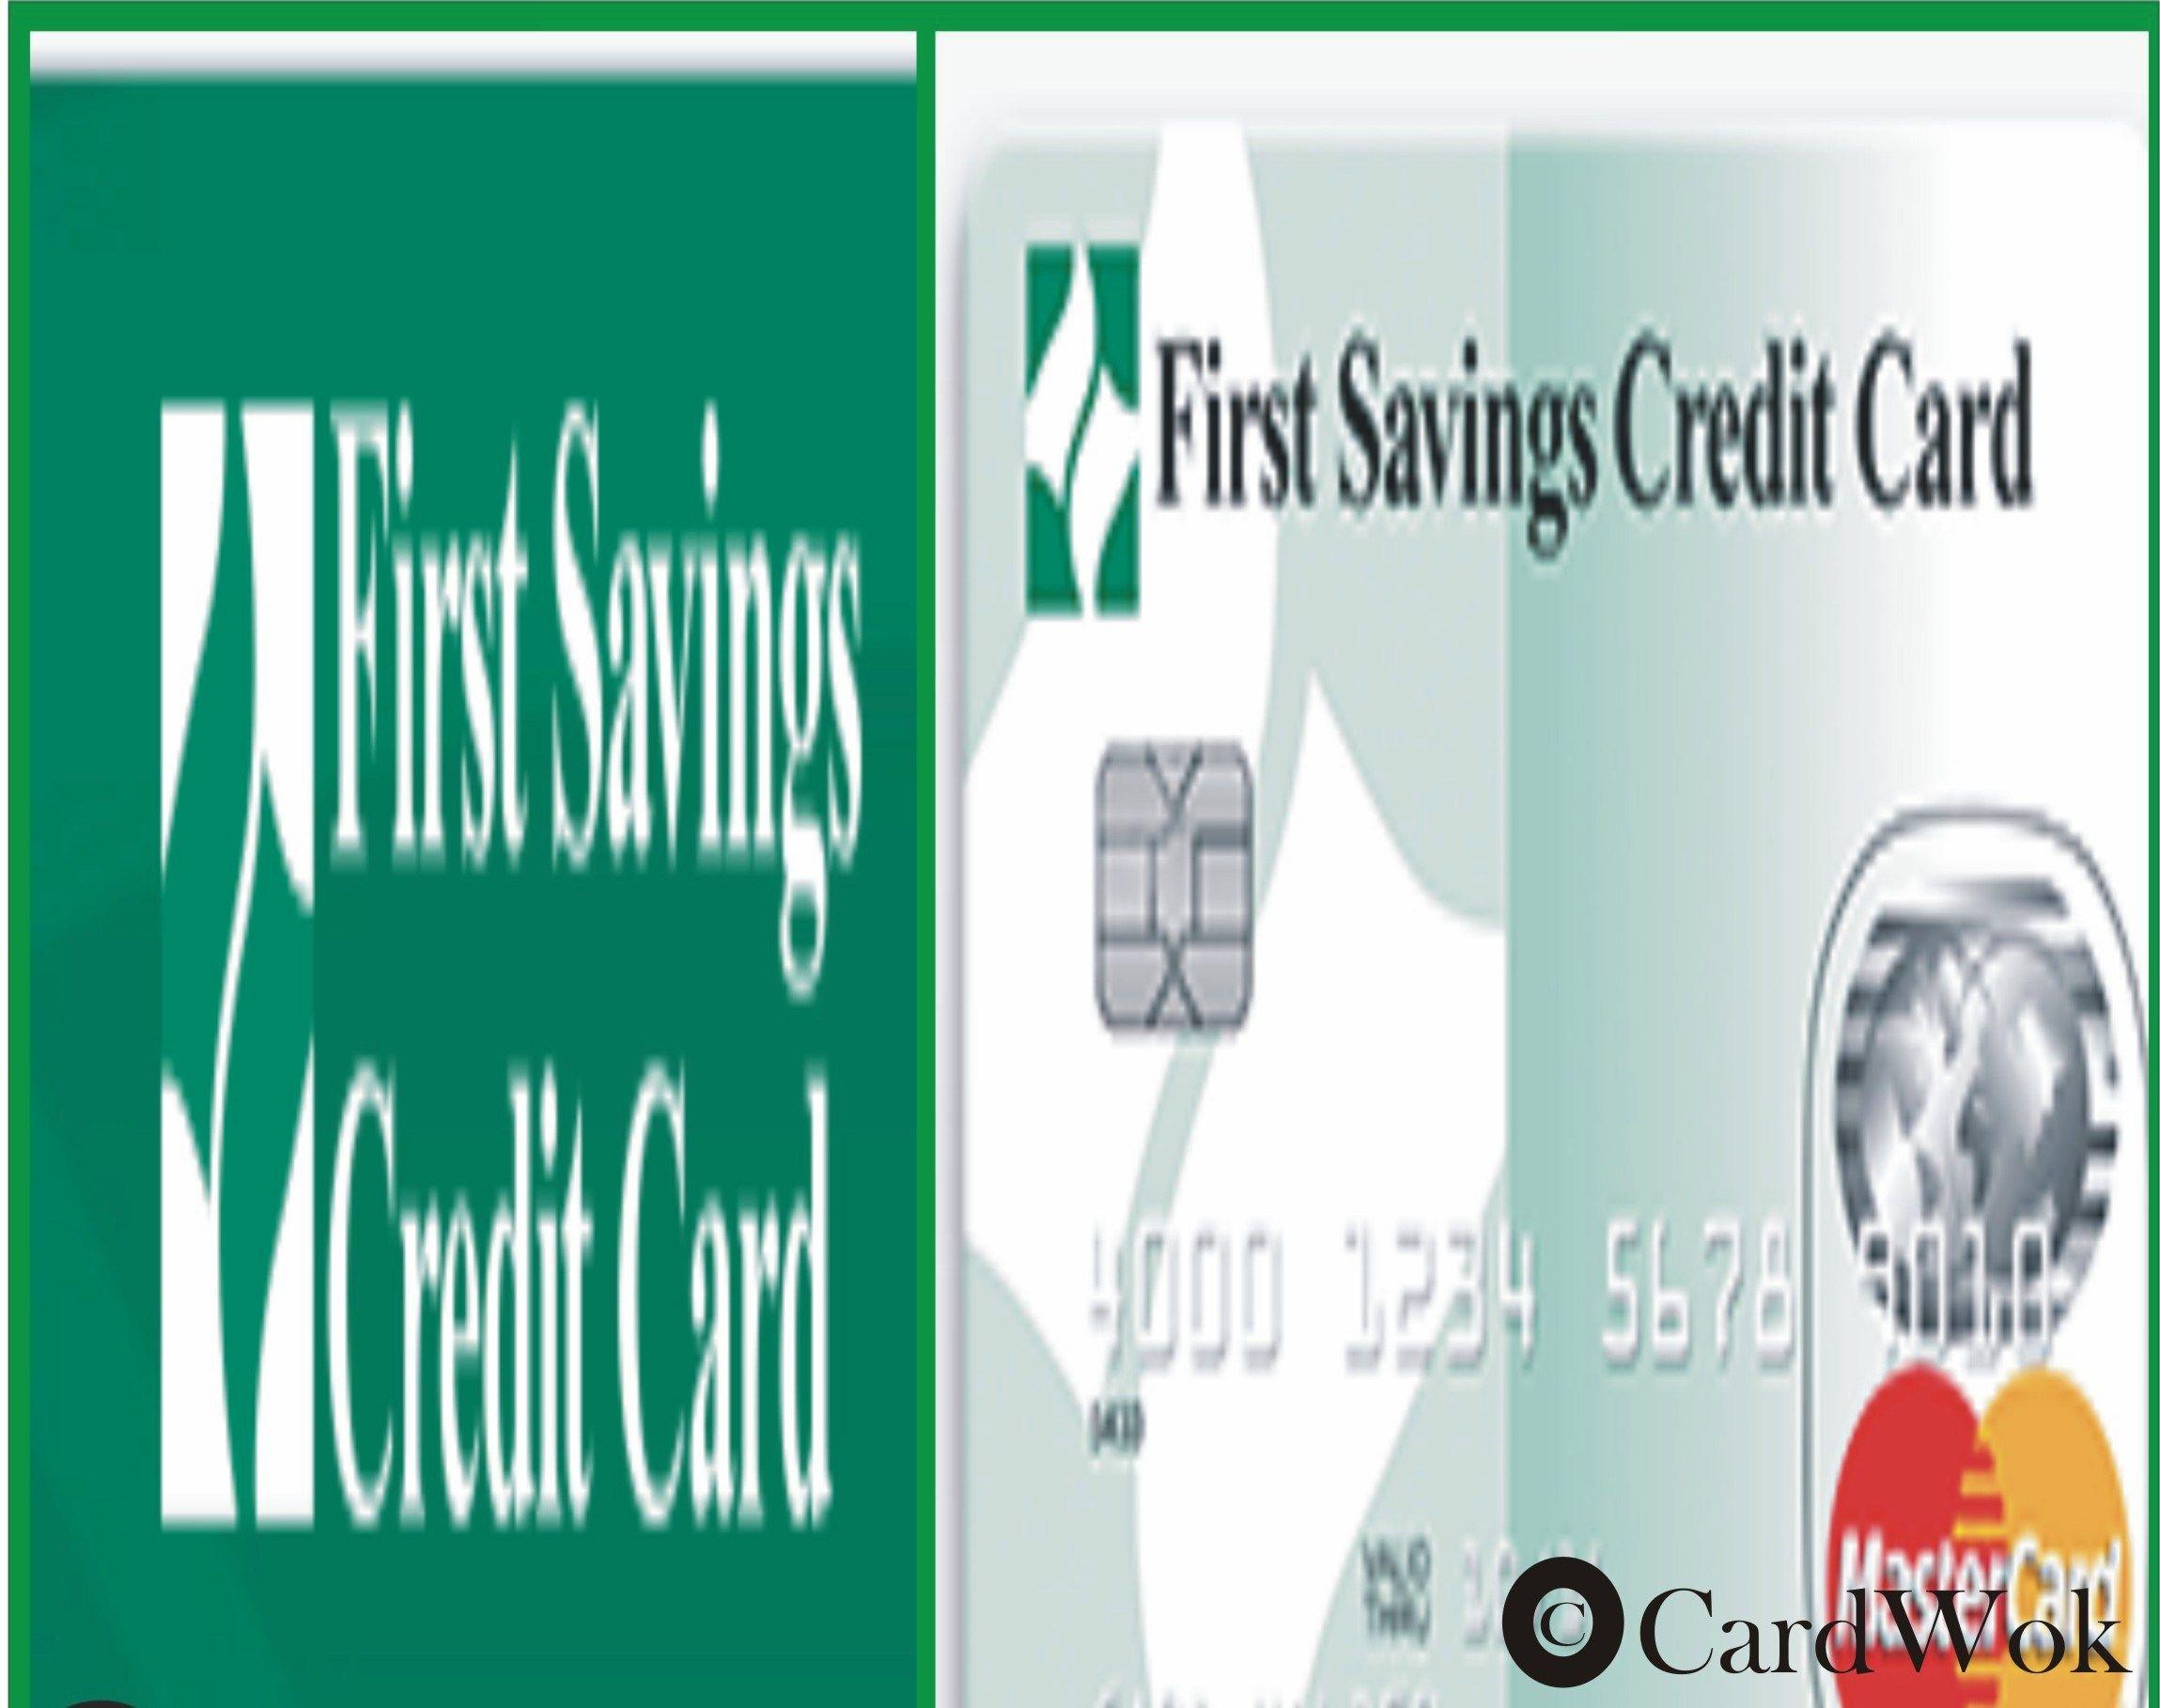 Delta Amex Login >> www.firstsavingscc.com/accept | First Savings Bank Credit ...